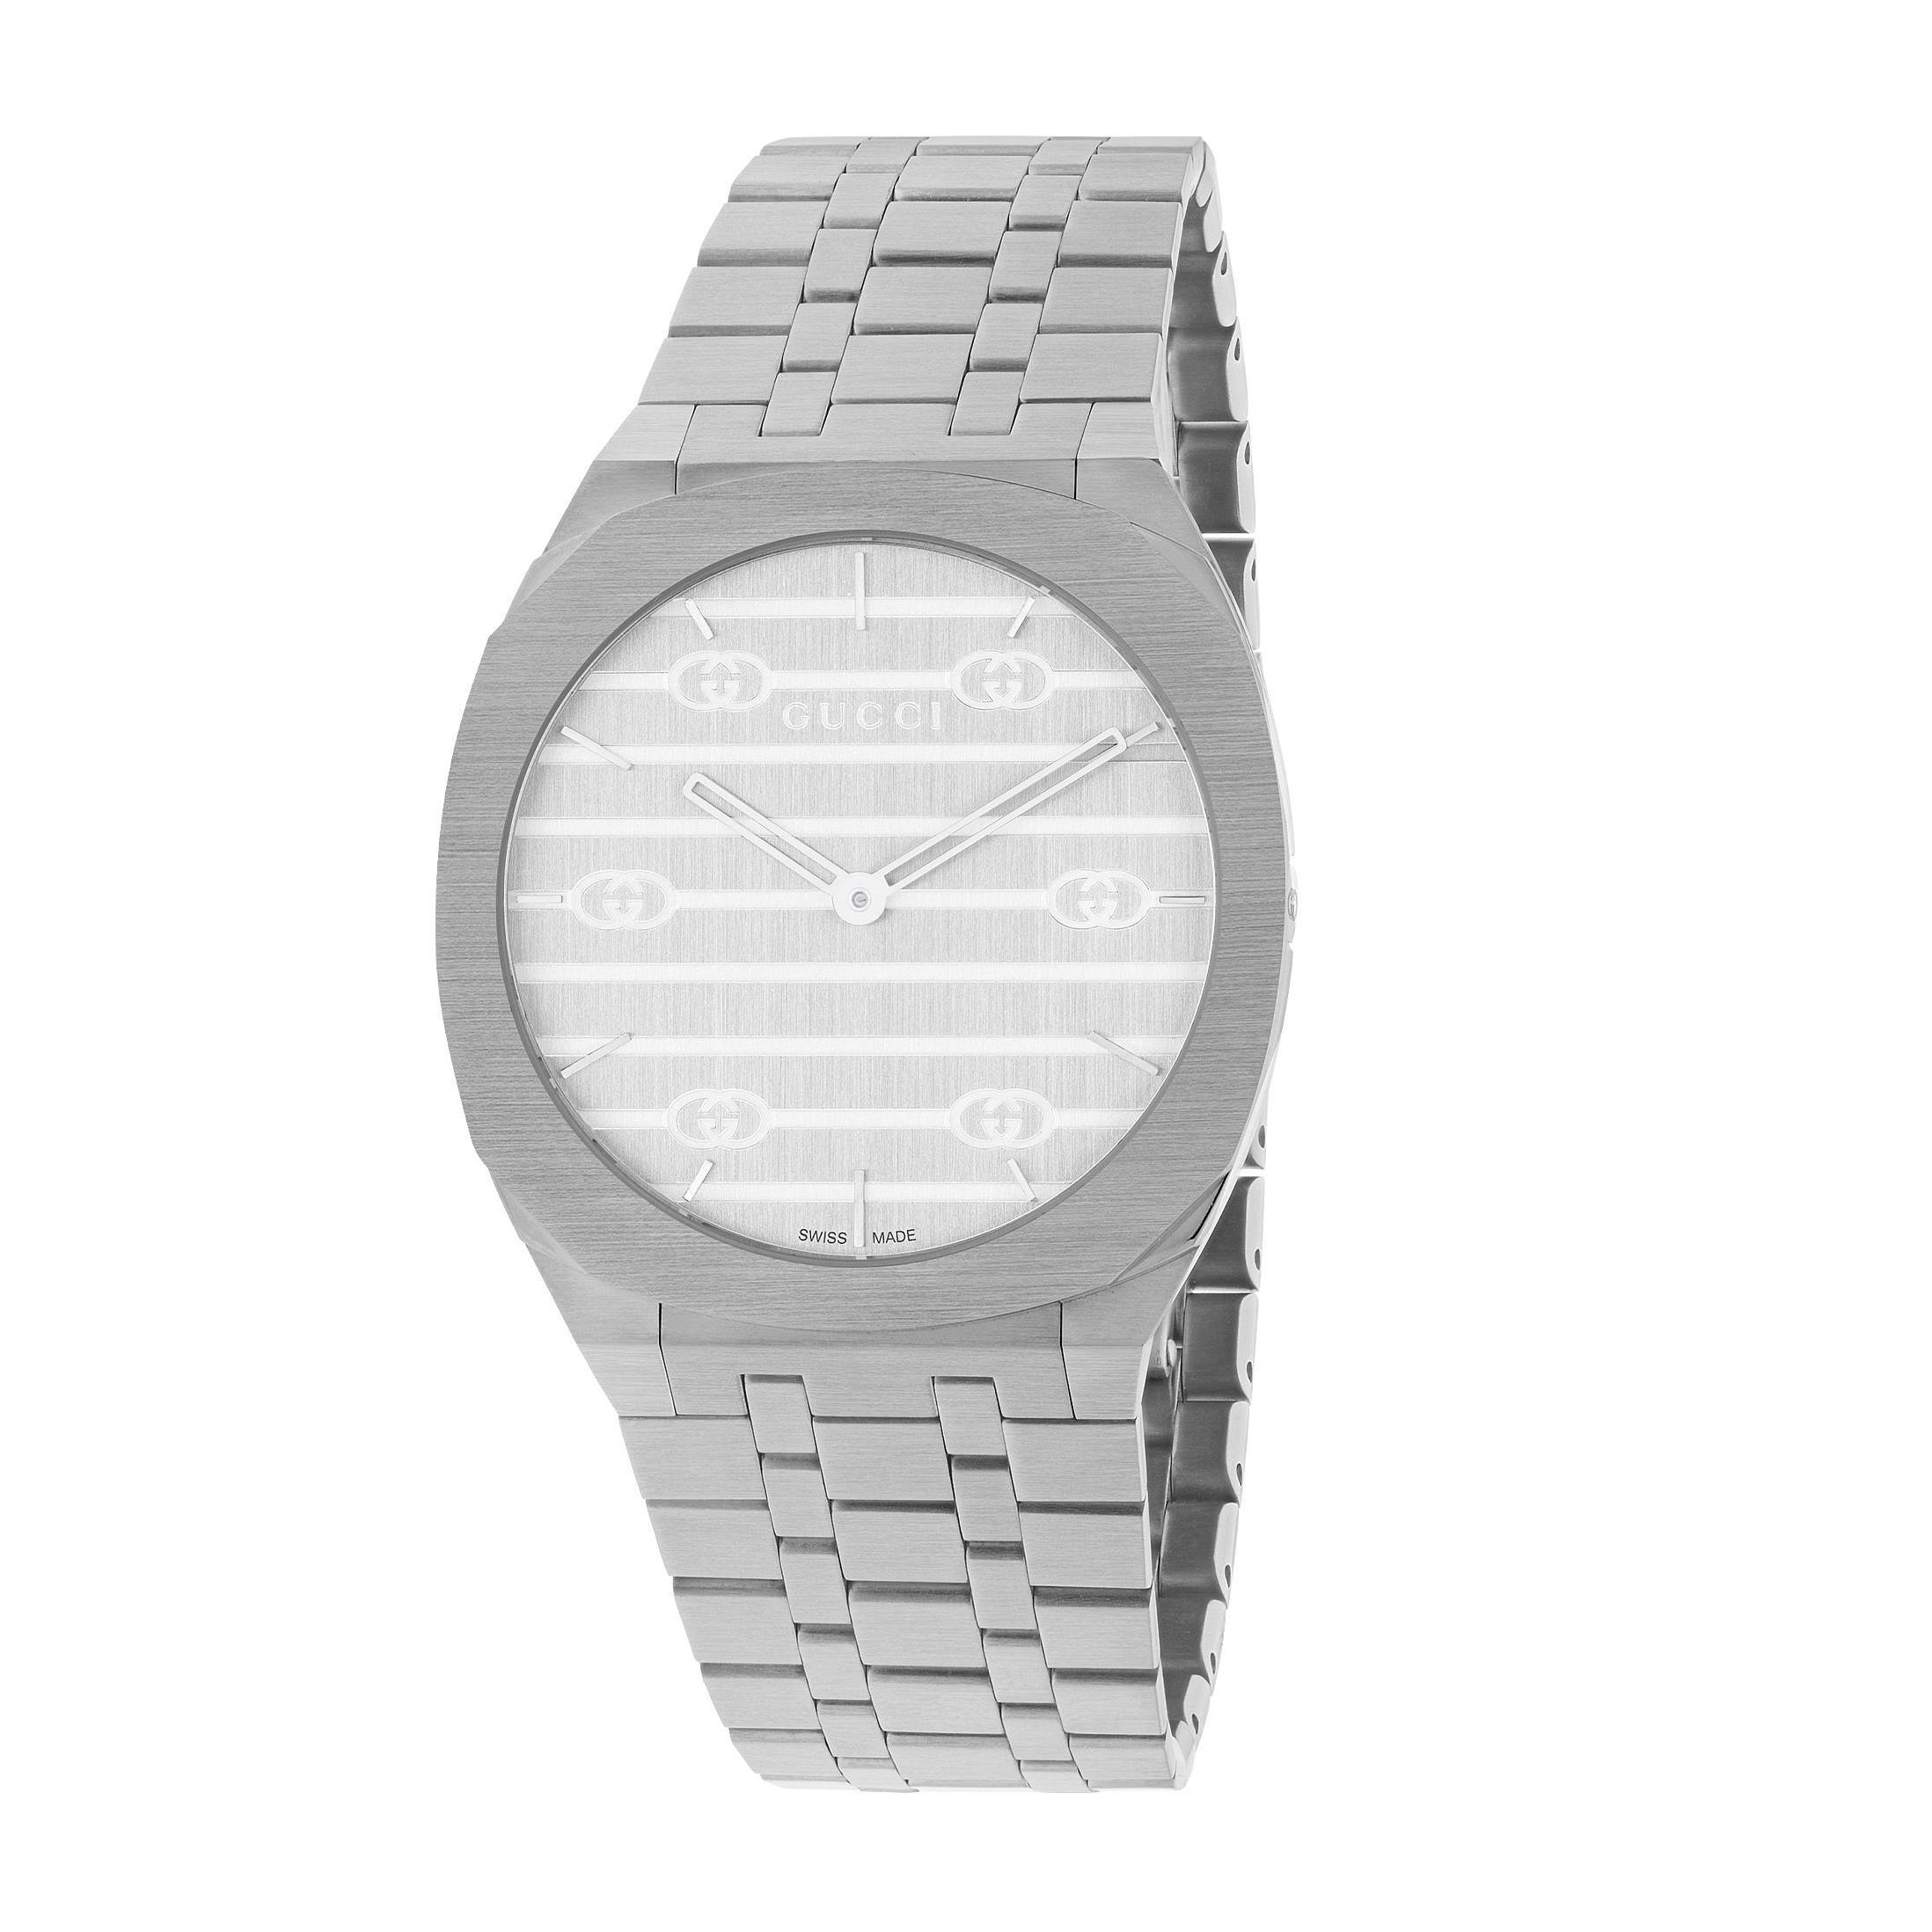 Orologio Gucci 25H 34 mm watch sconto discount